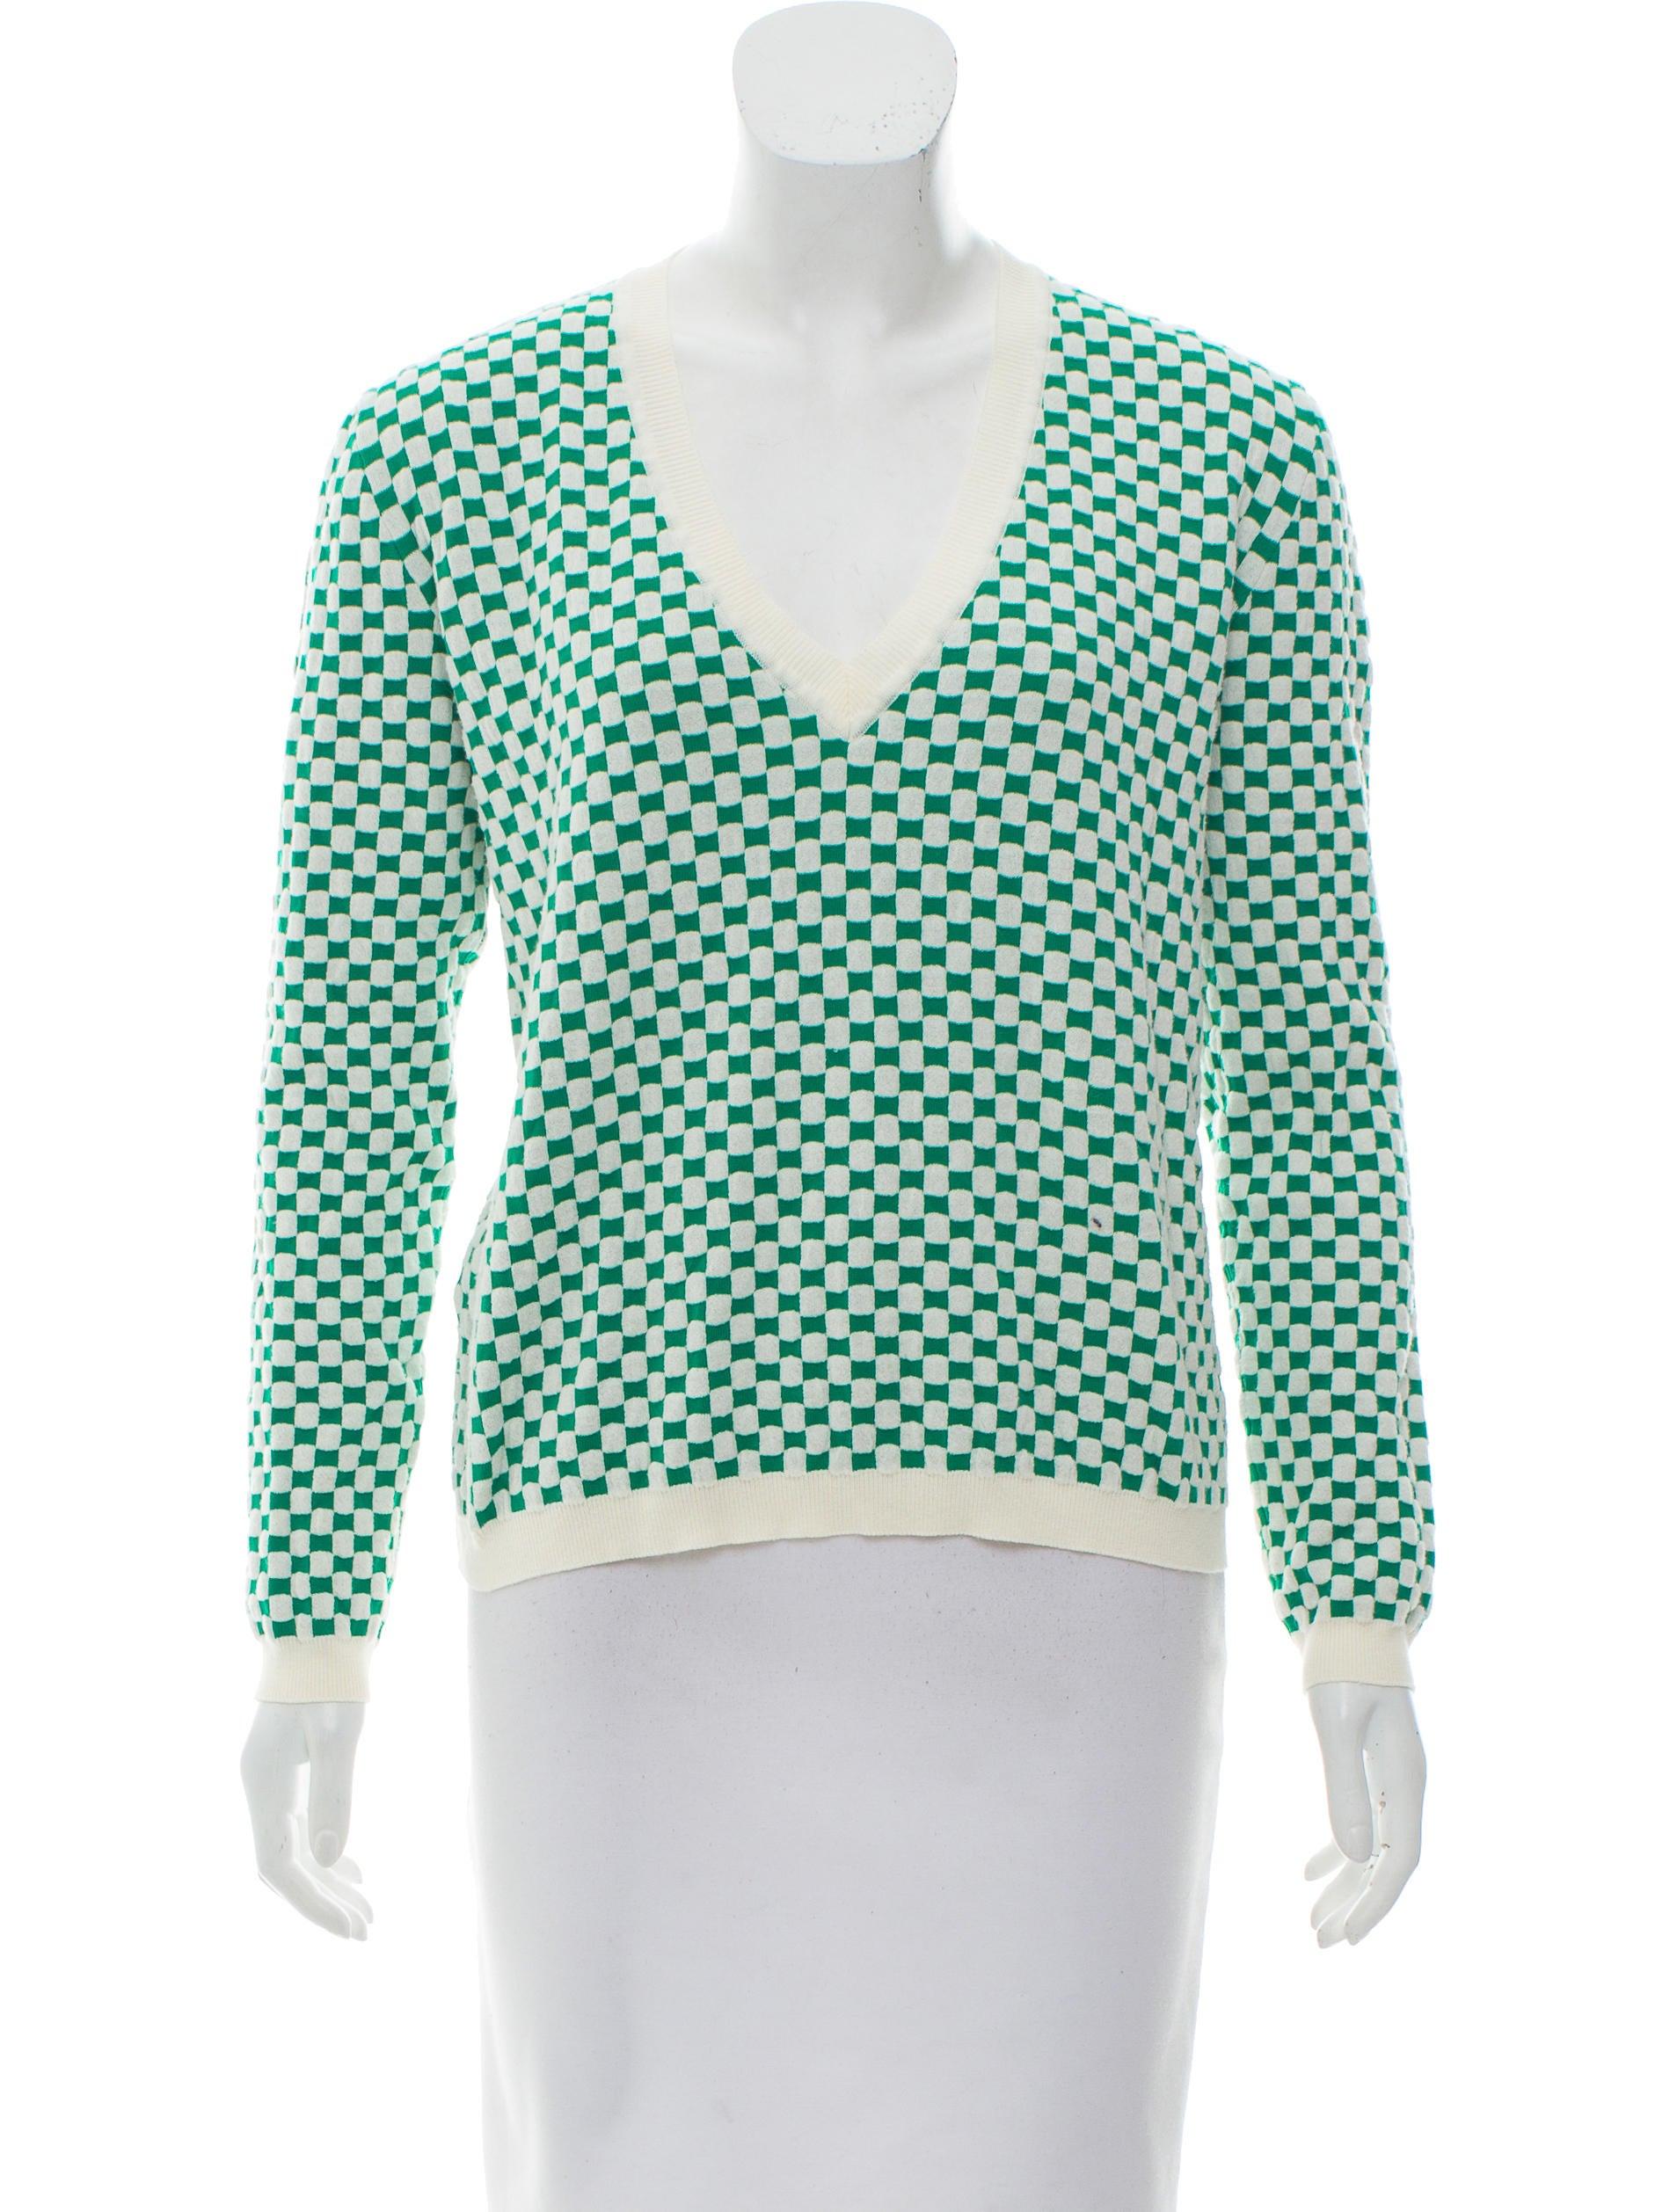 Marni Jacquard Long Sleeve Sweater - Clothing